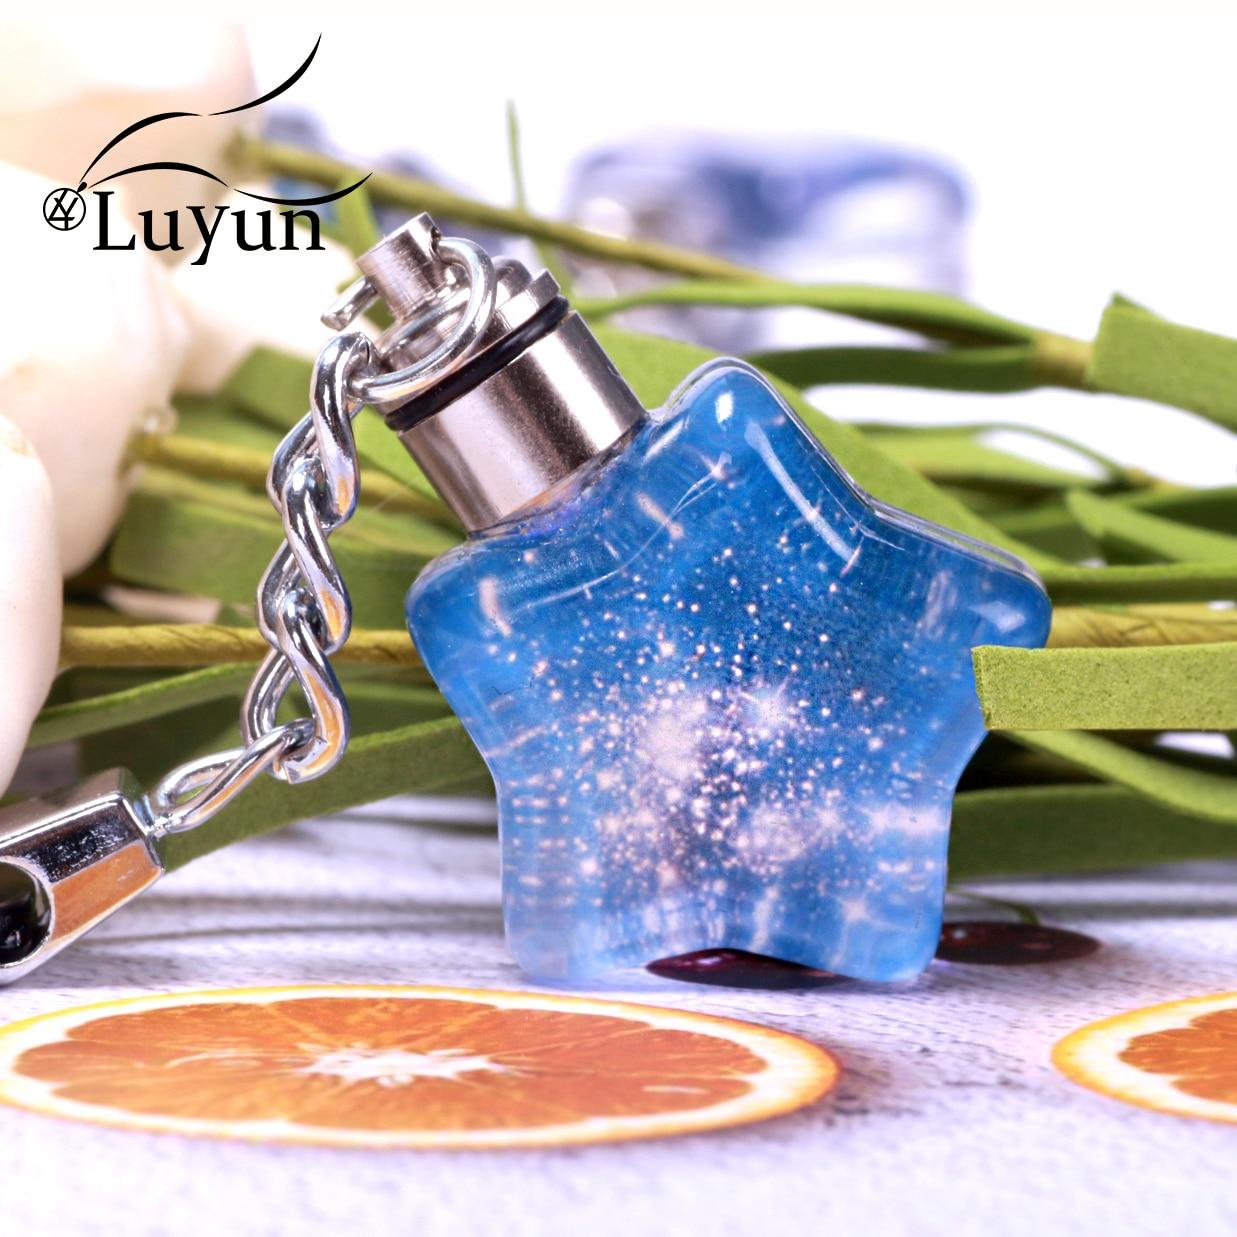 Luyun Creative Star KeyChain Glowing Jewelry Crystal Glass Key Chain Wholesale Free Shipping